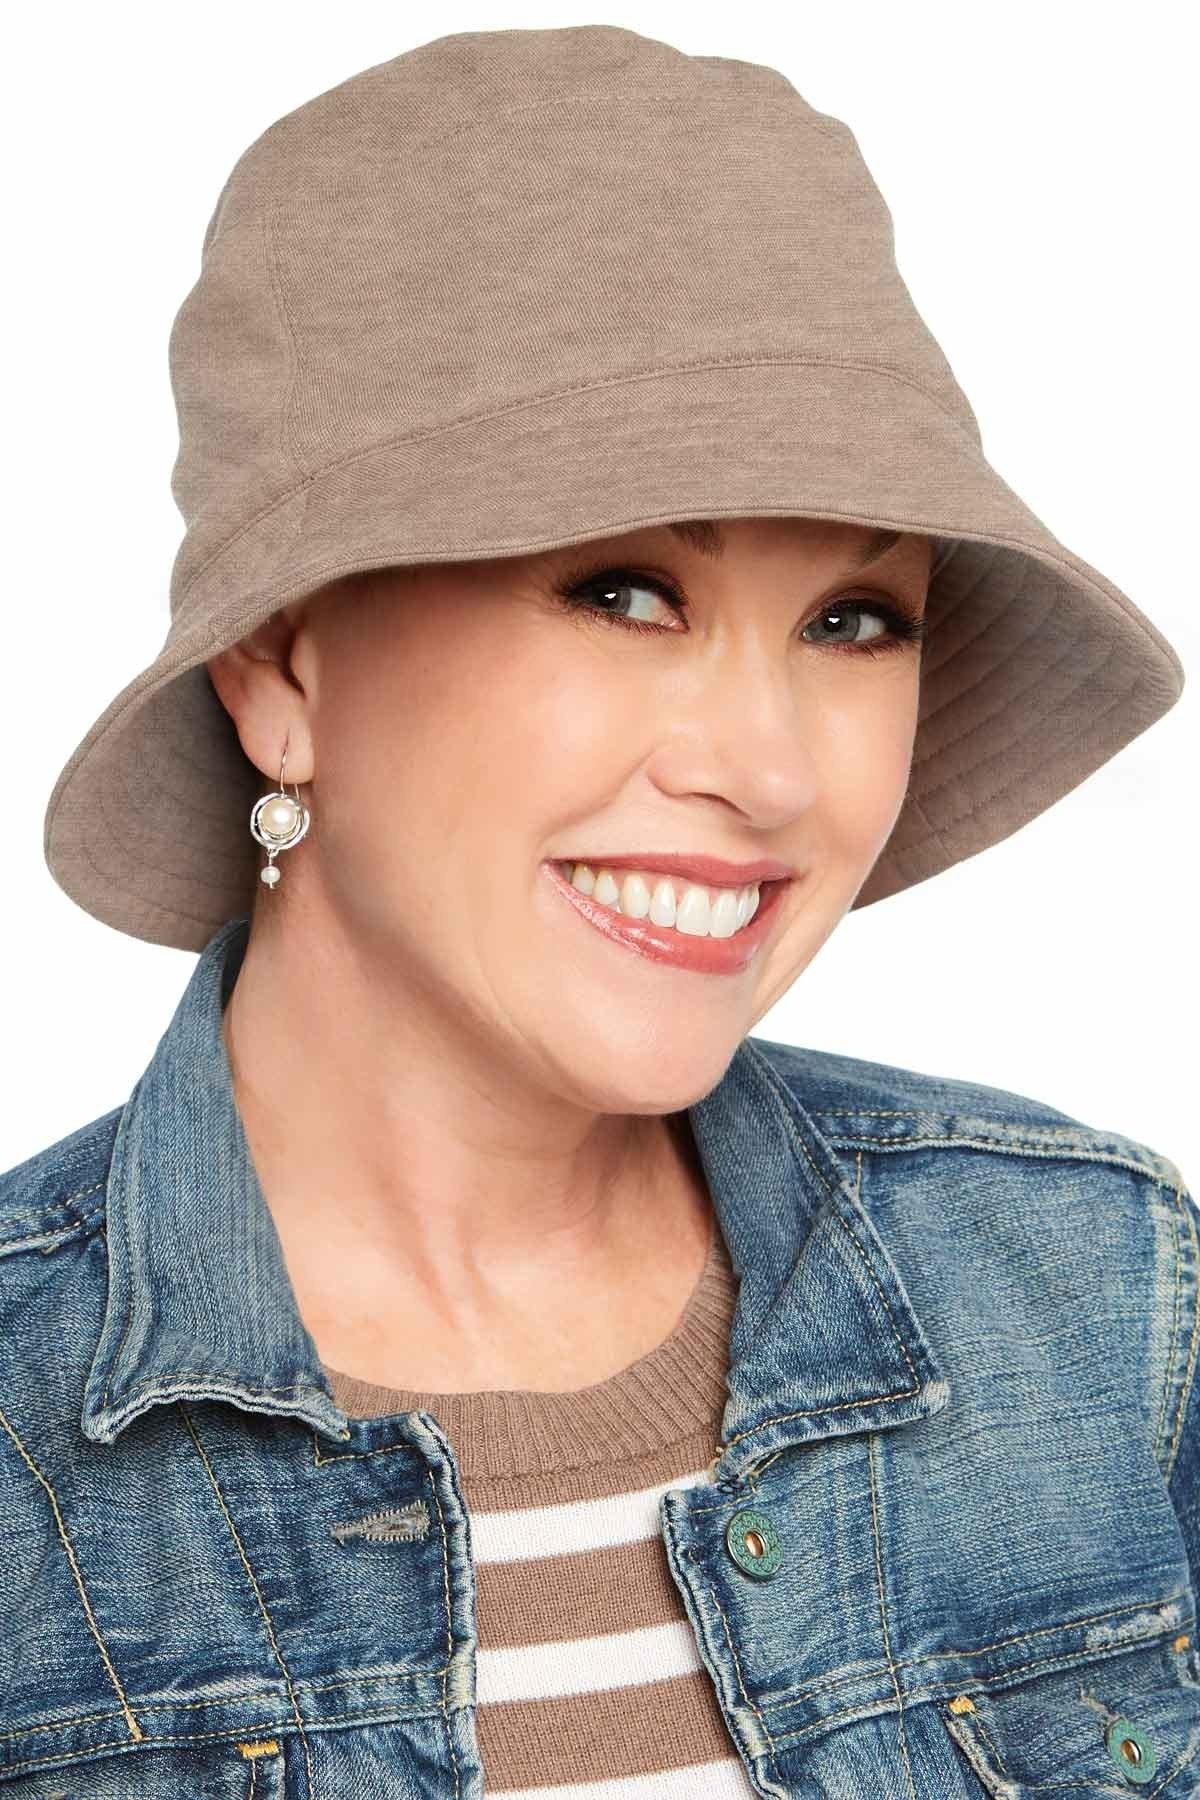 Sun Protection UPF 50+ Bucket Hat | 100% Cotton with Aloe Vera Lining UPF Heather Taupe | Large